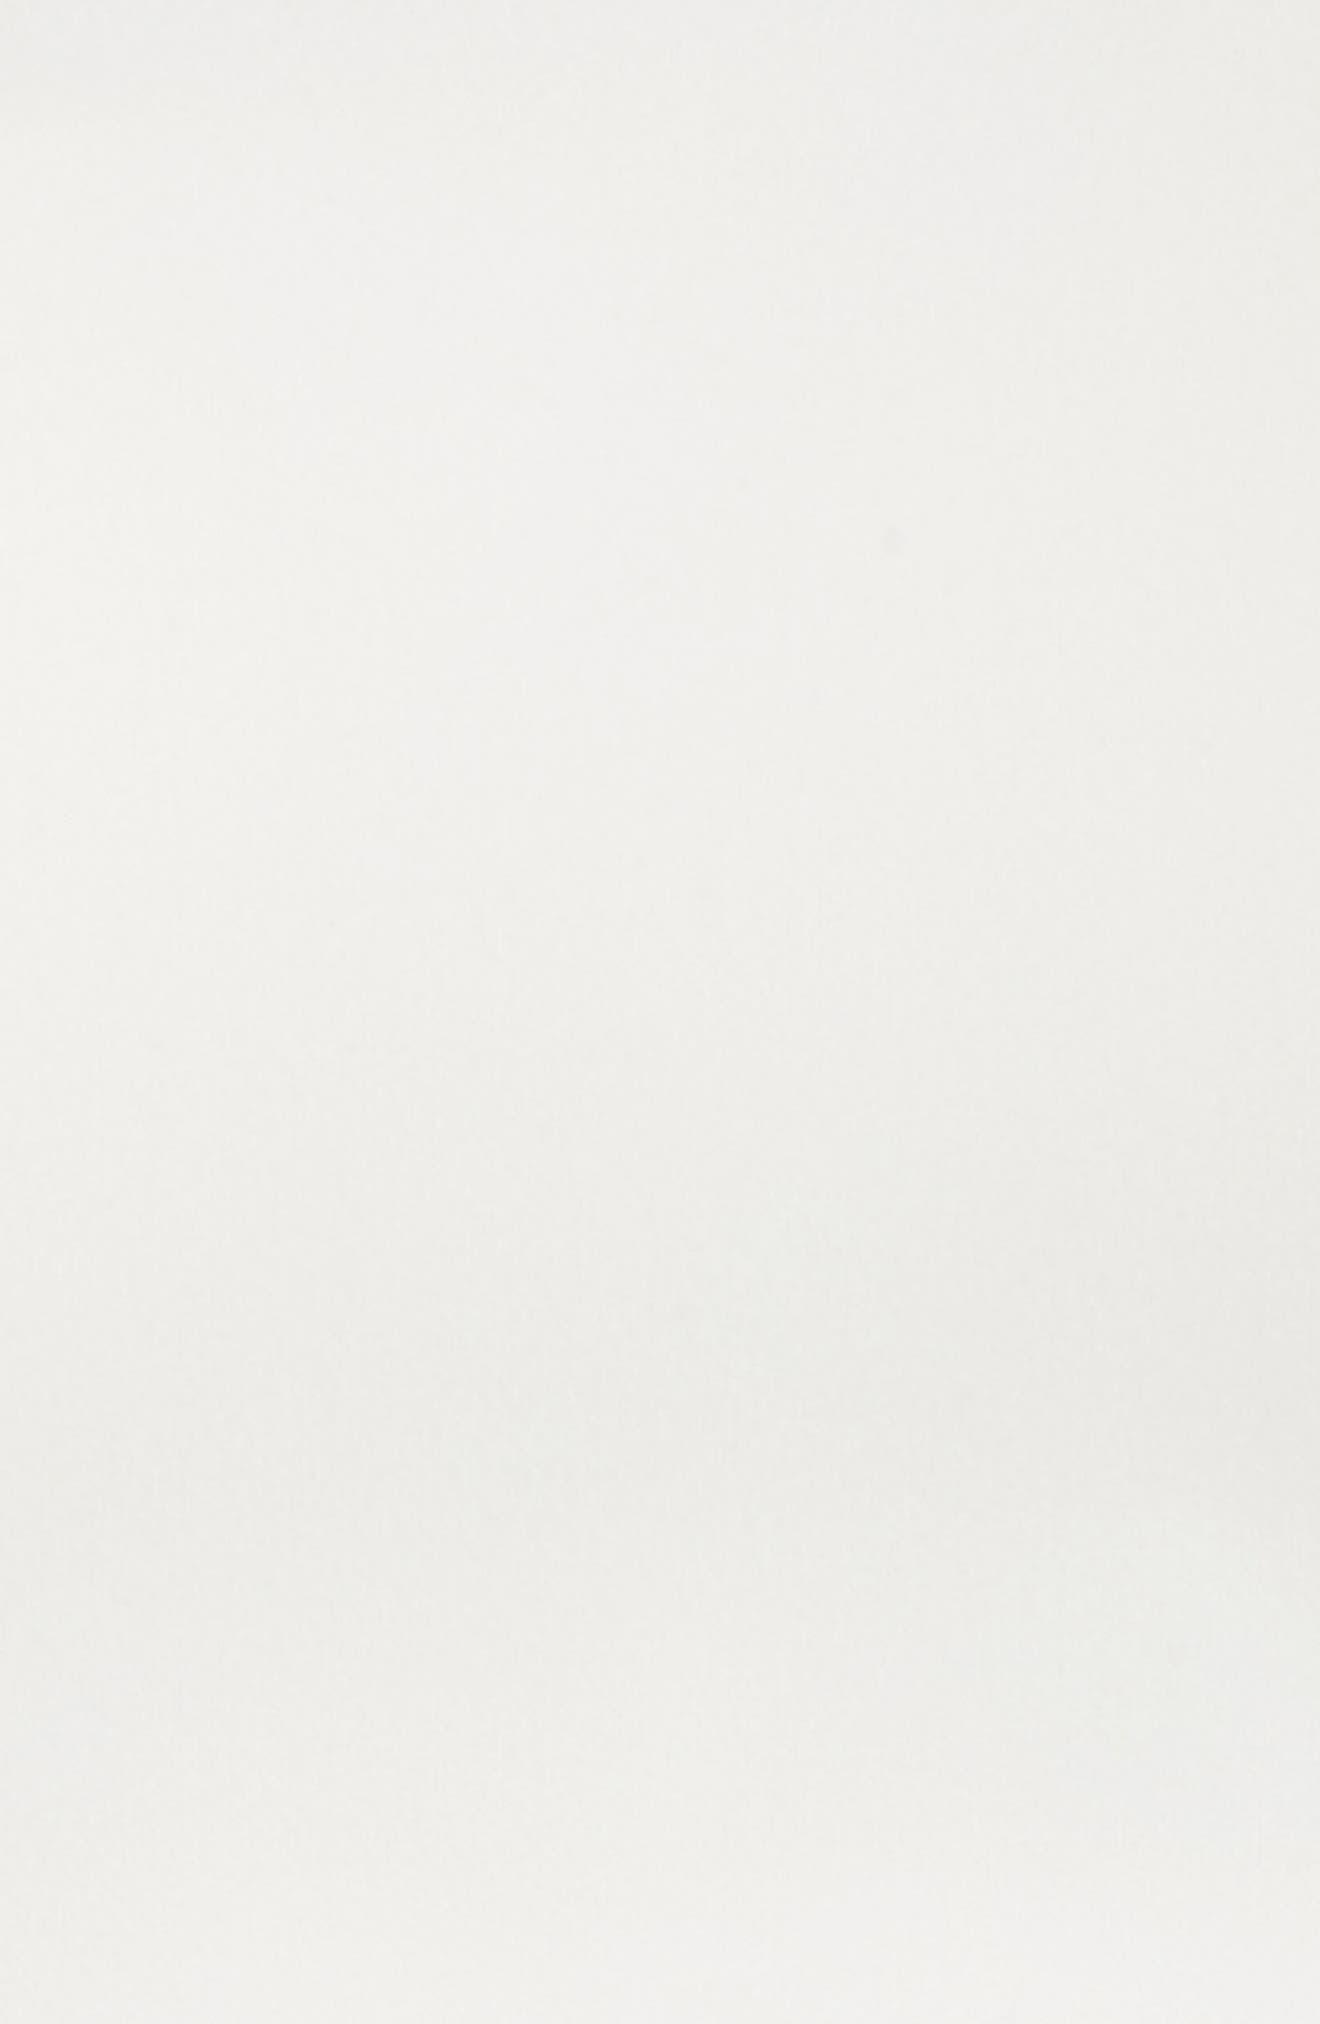 Kate Elastic Strap Cutout Sheath Dress,                             Alternate thumbnail 5, color,                             902